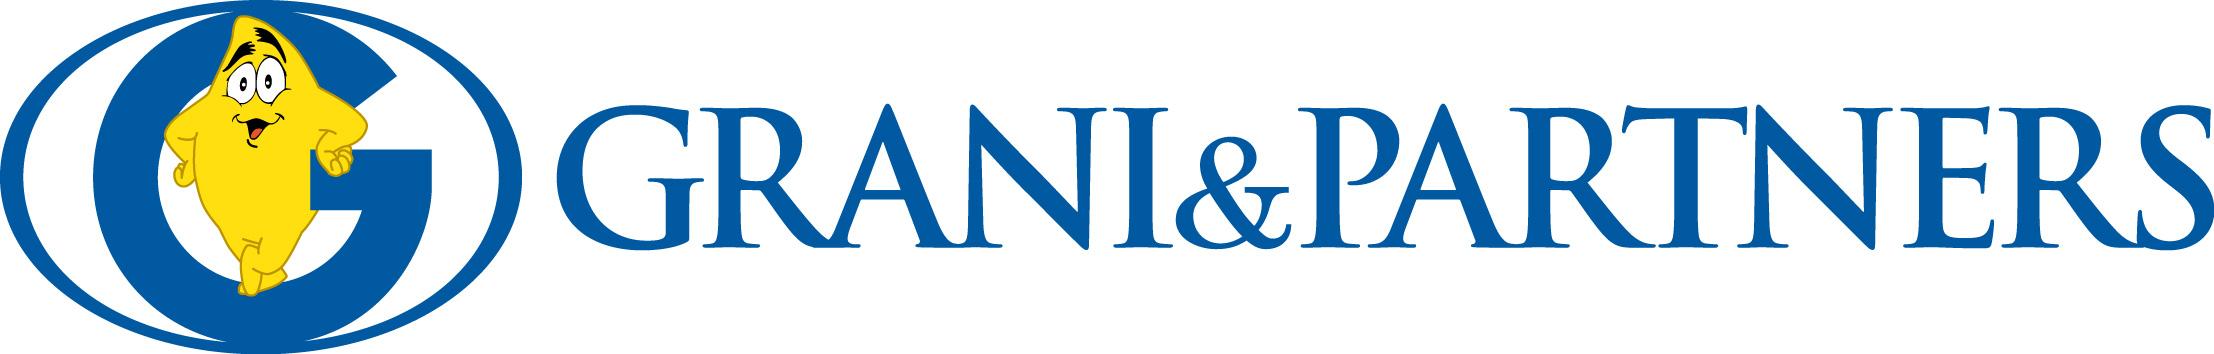 Gruppo Grani&Partners